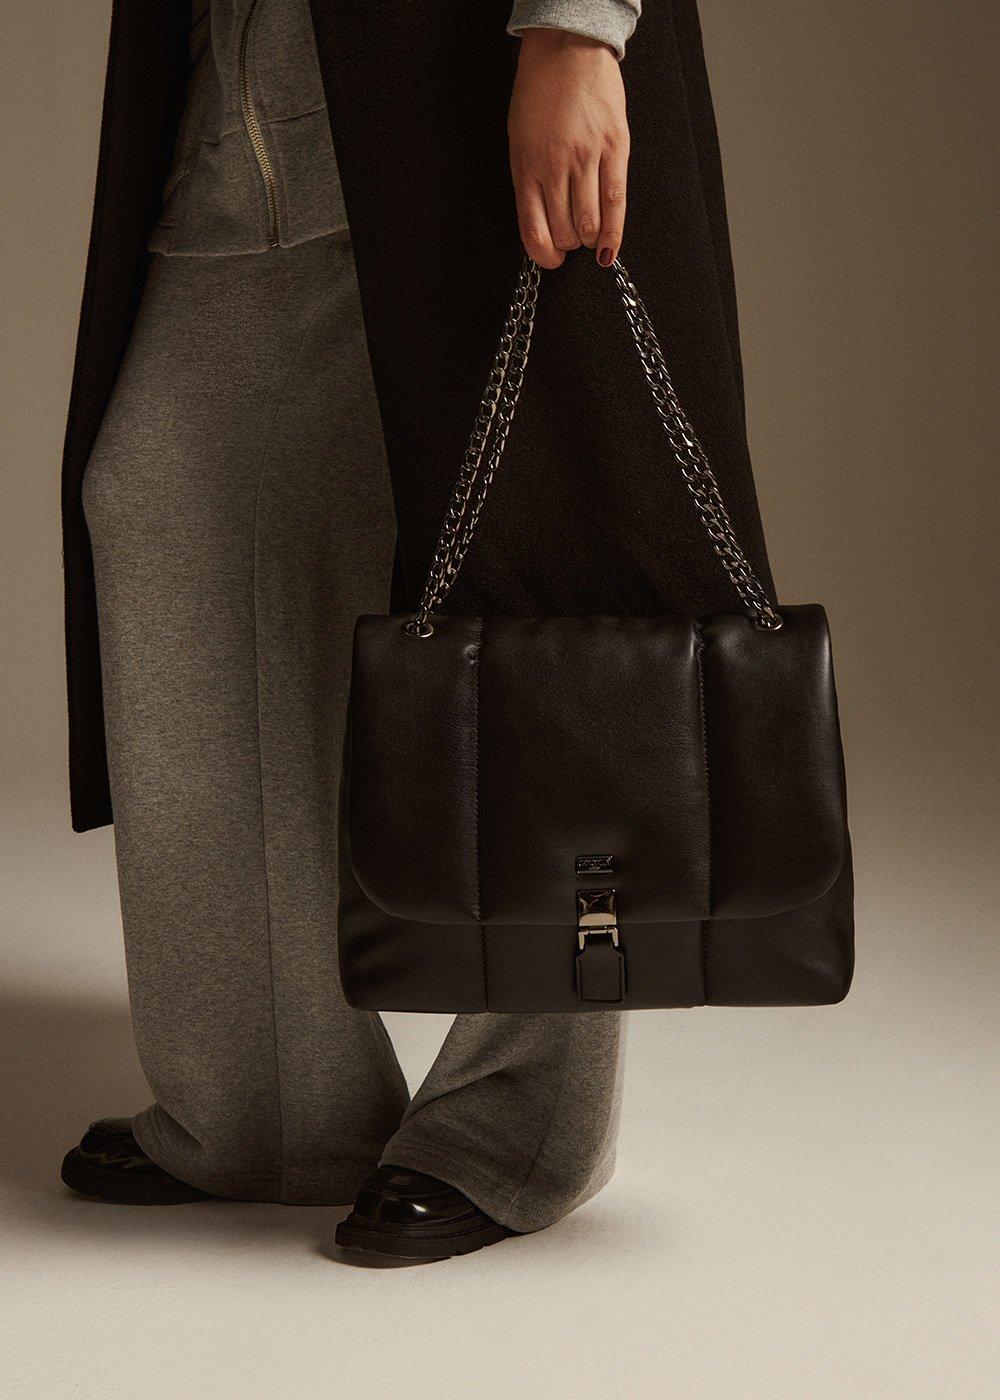 Biarn bag with flap - Black - Woman